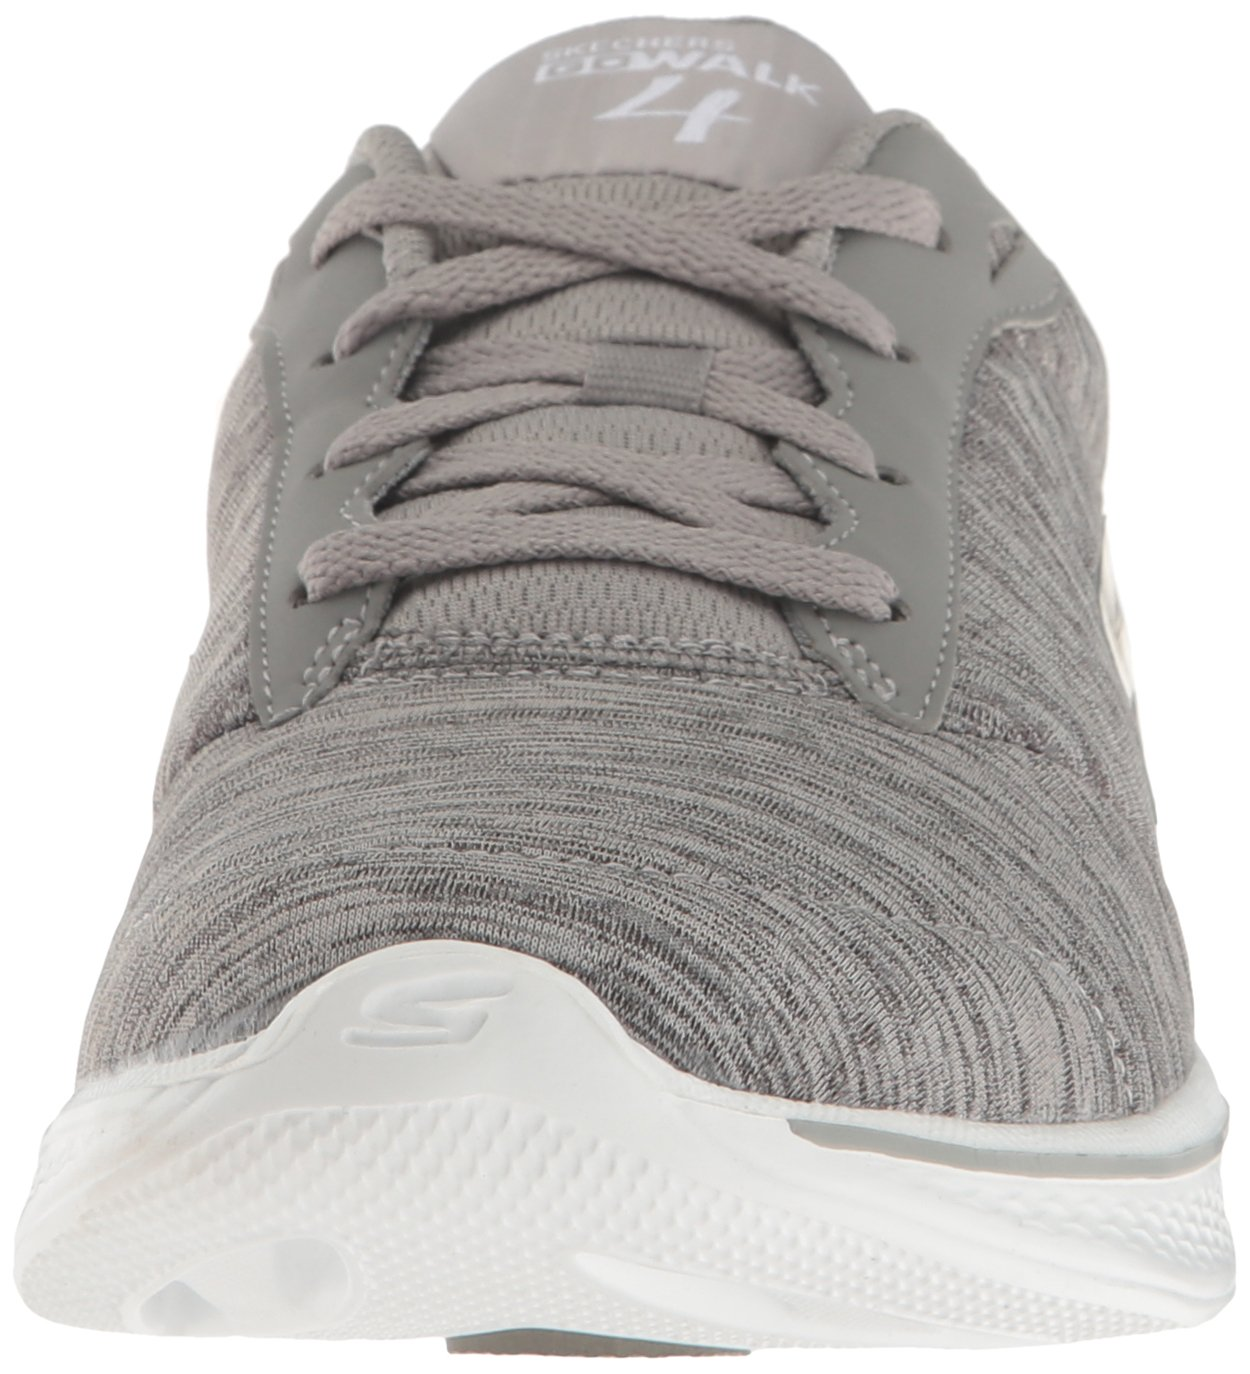 Skechers Performance Women's Go Walk 4 Lace-up B(M) Walking Shoe B01IIZ9MAW 6 B(M) Lace-up US|Gray Heather 53e507